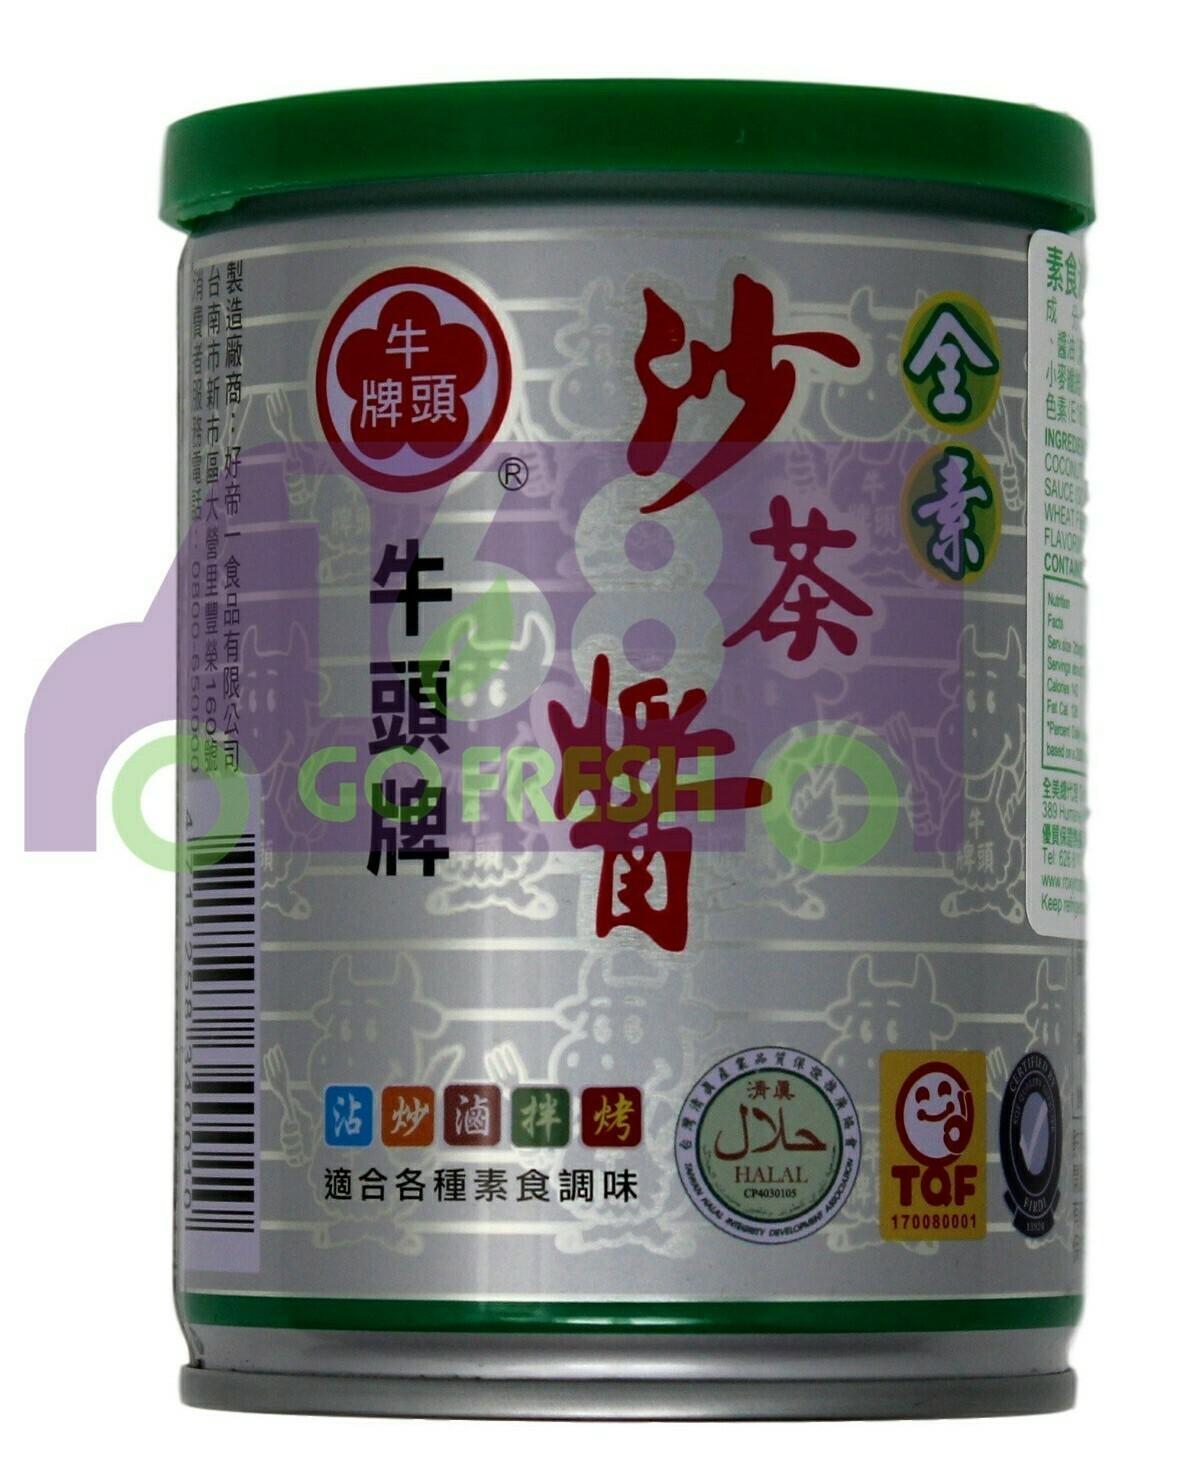 BULL HEAD VEGETARIAN BARBECUE SAUCE 牛头牌 全素沙茶酱(250G)